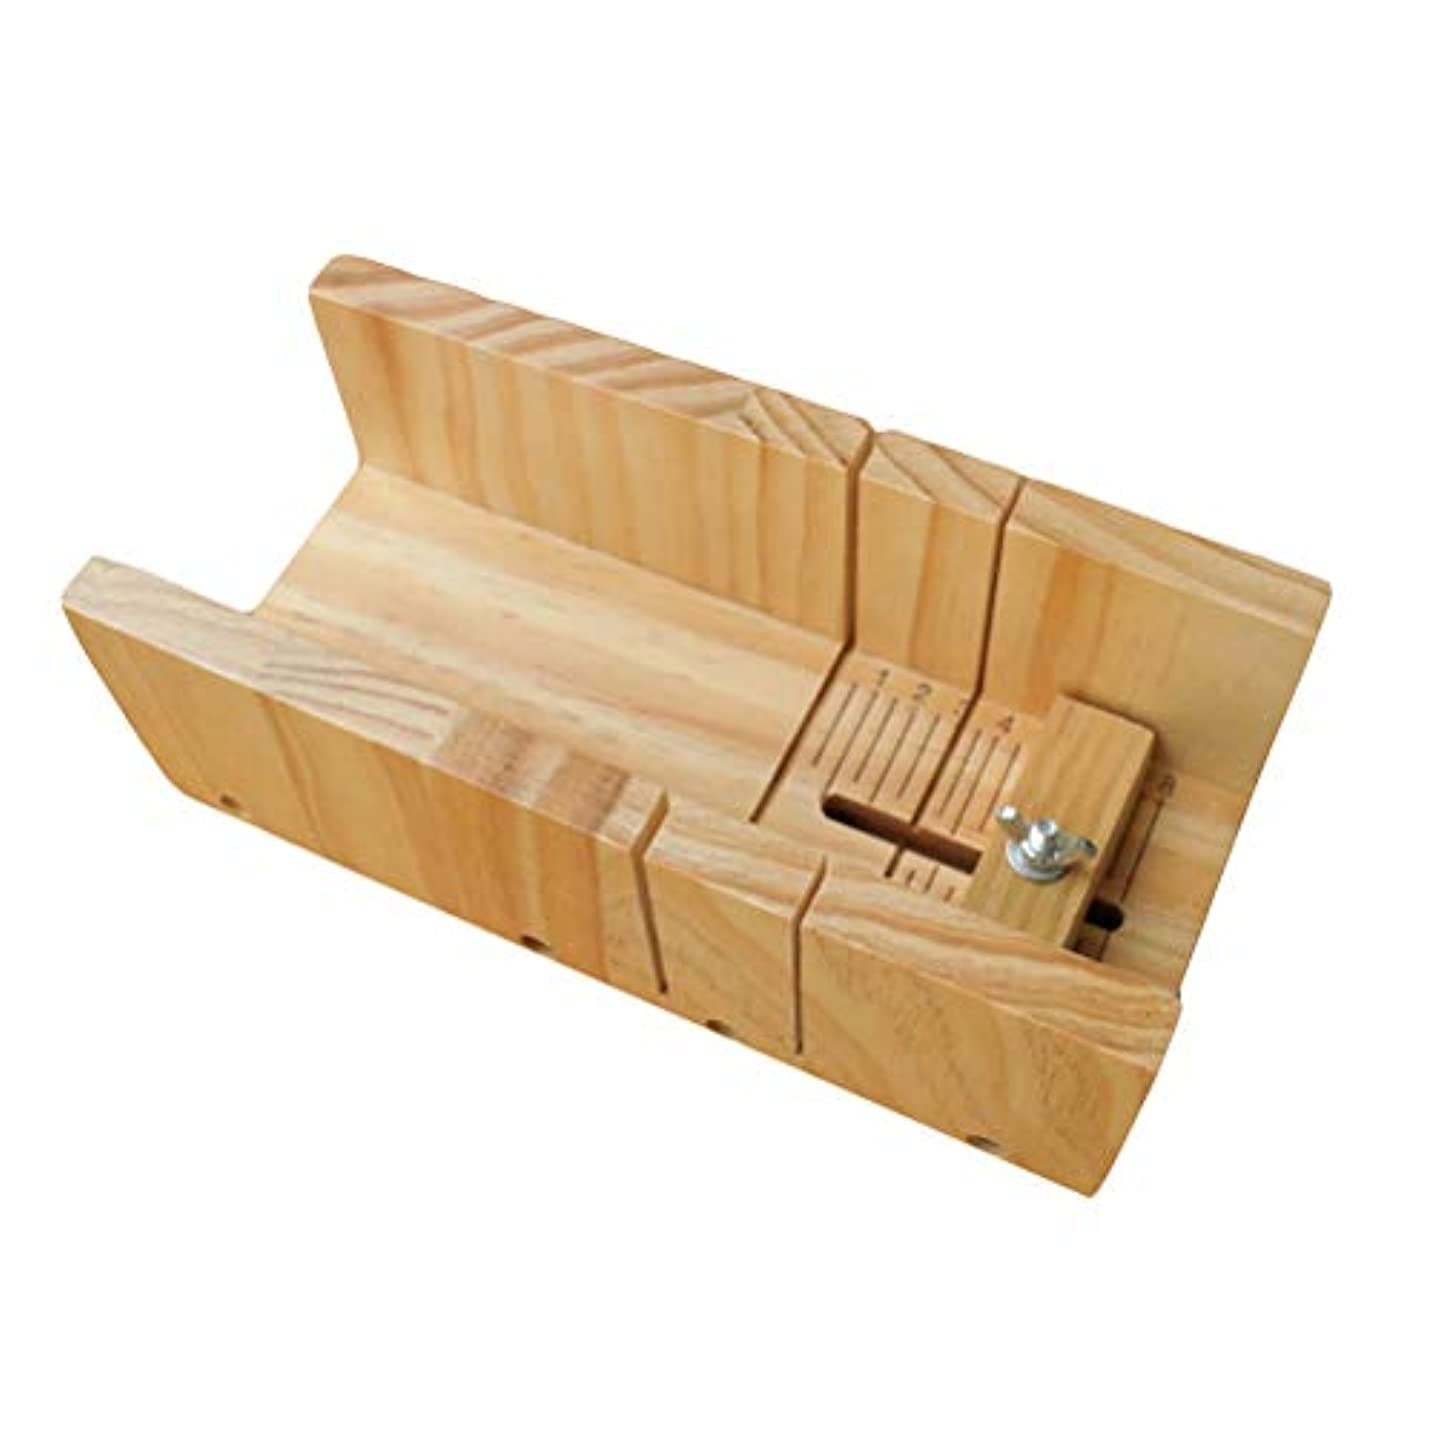 SUPVOX ウッドソープローフカッター金型調整可能カッター金型ボックスソープ作りツール(ウッドカラー)